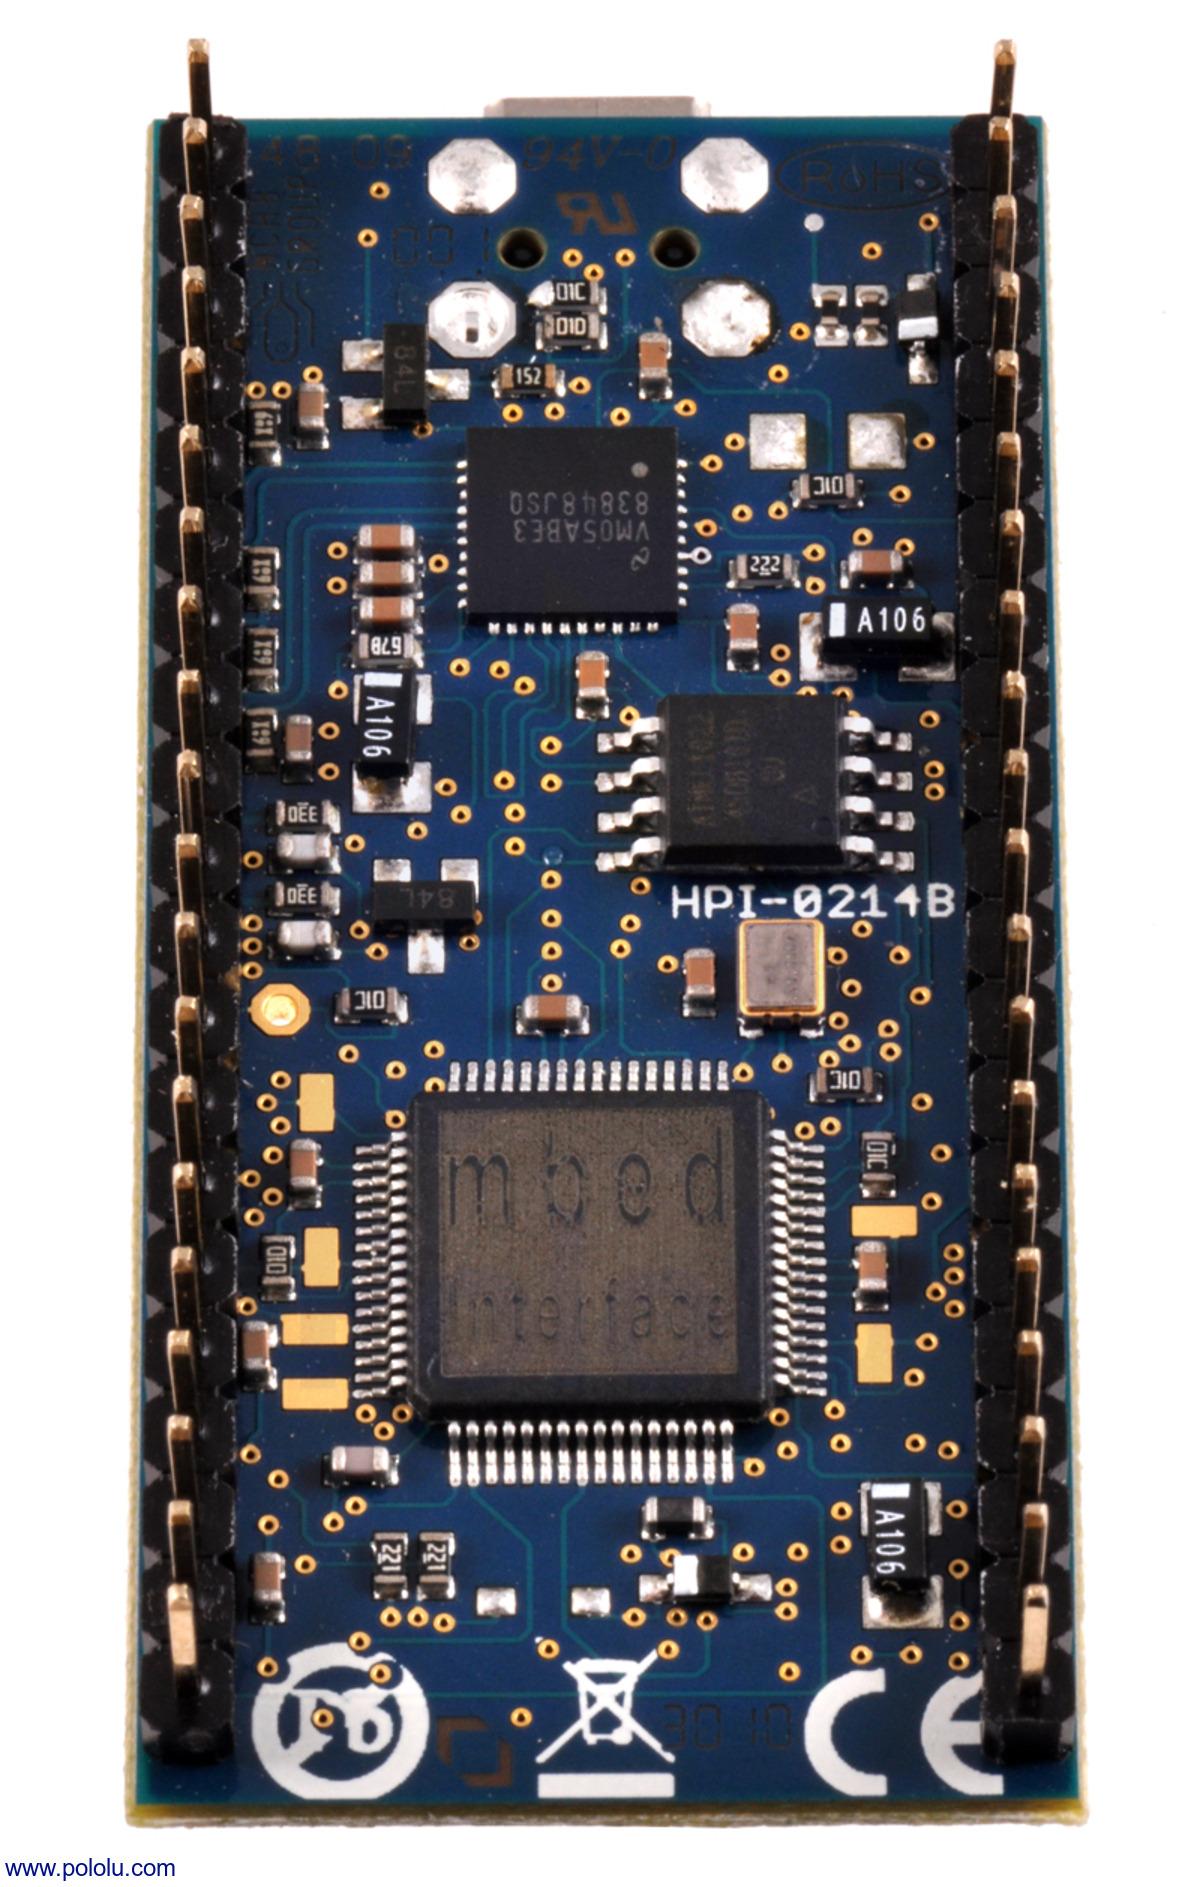 Pololu - ARM mbed NXP LPC1768 Development Board